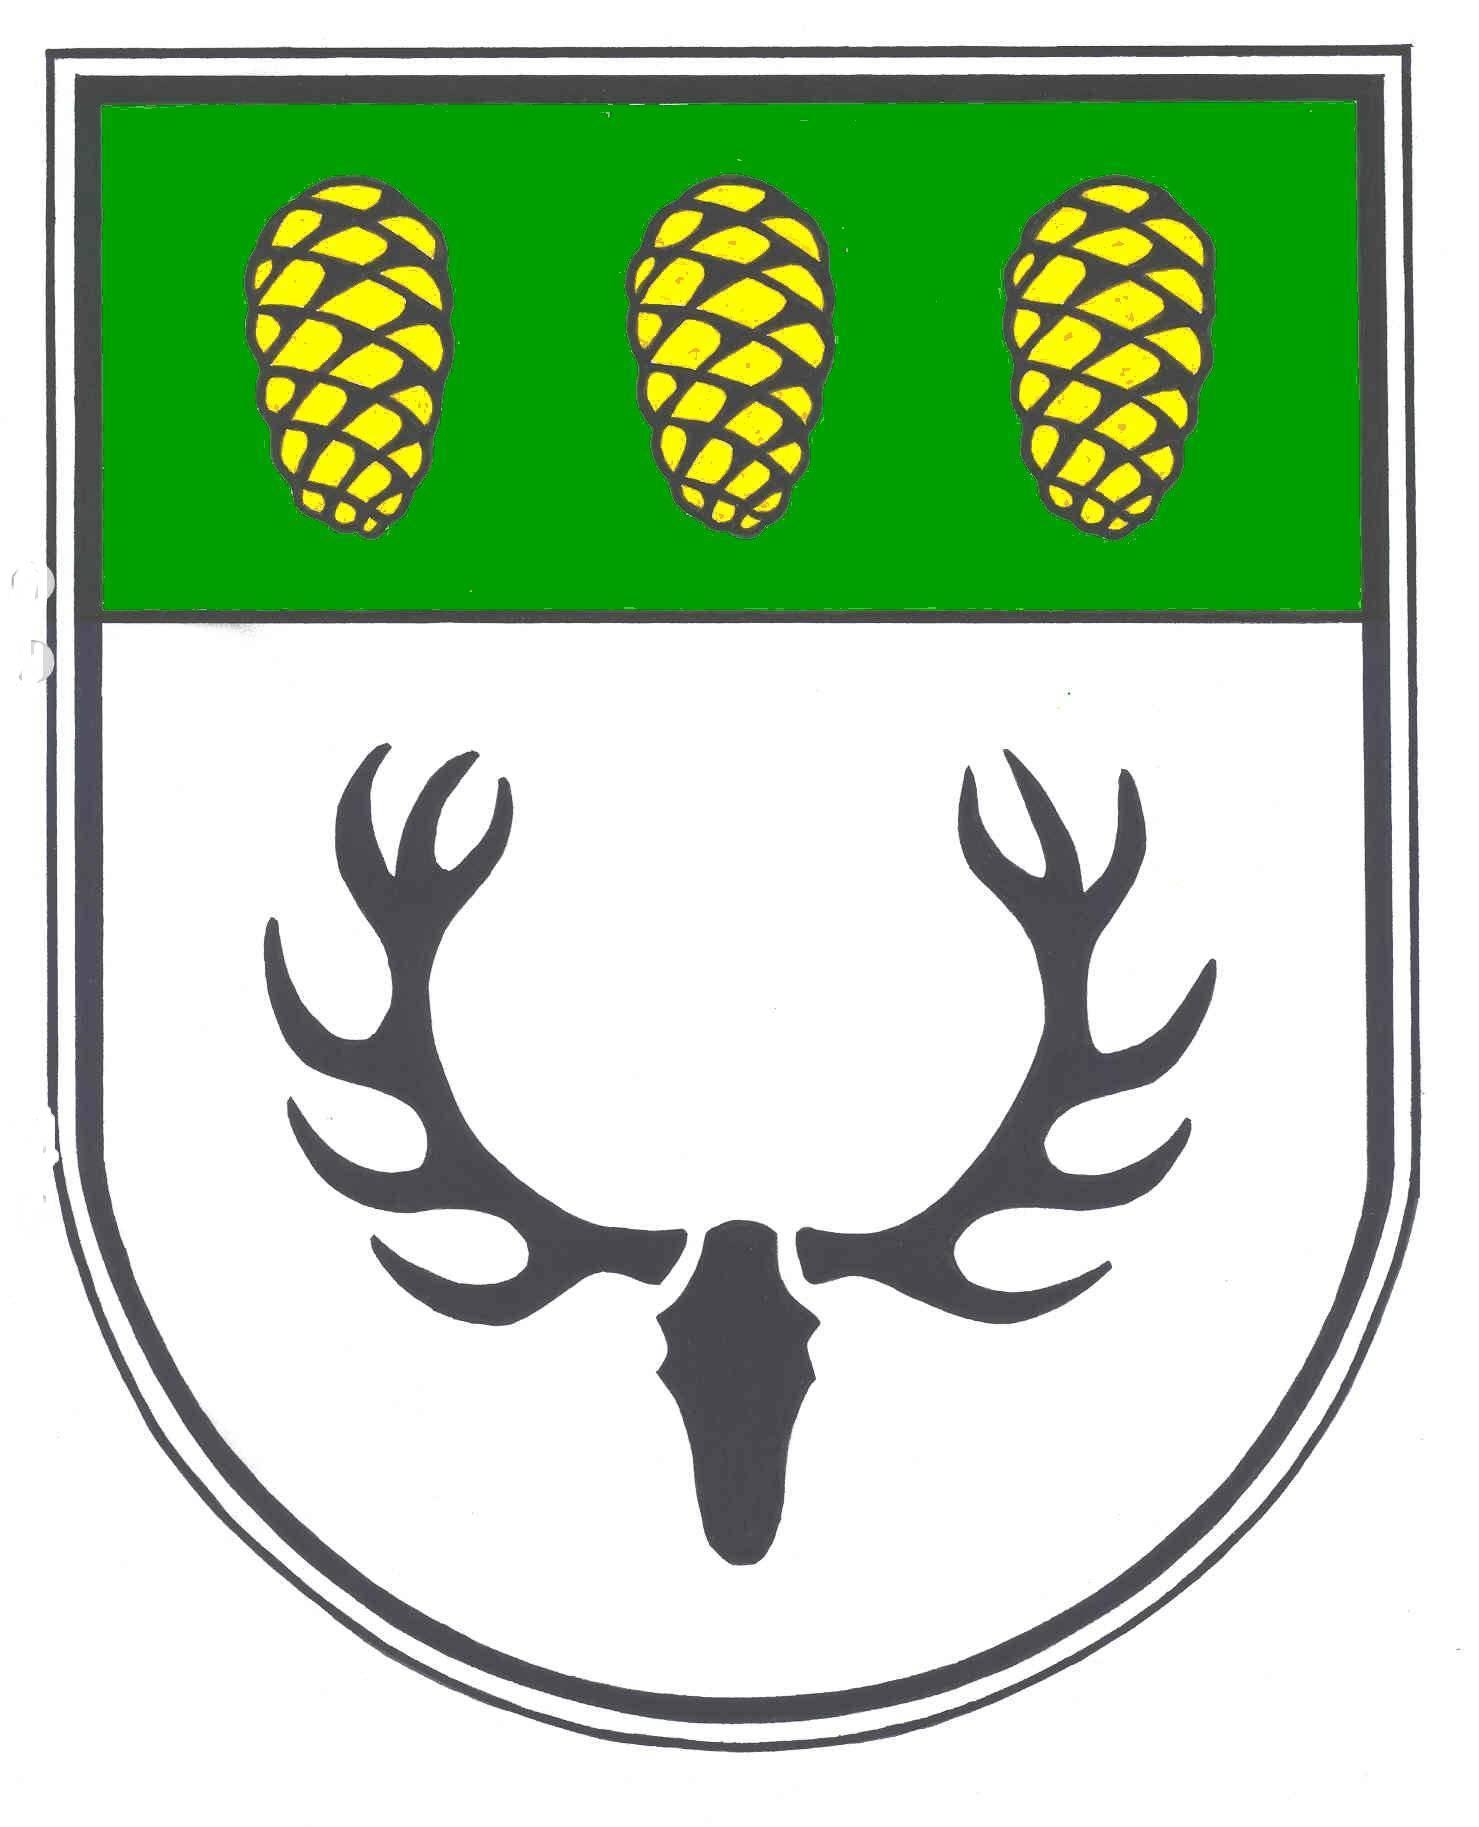 Wappen GemeindeHartenholm, Kreis Segeberg